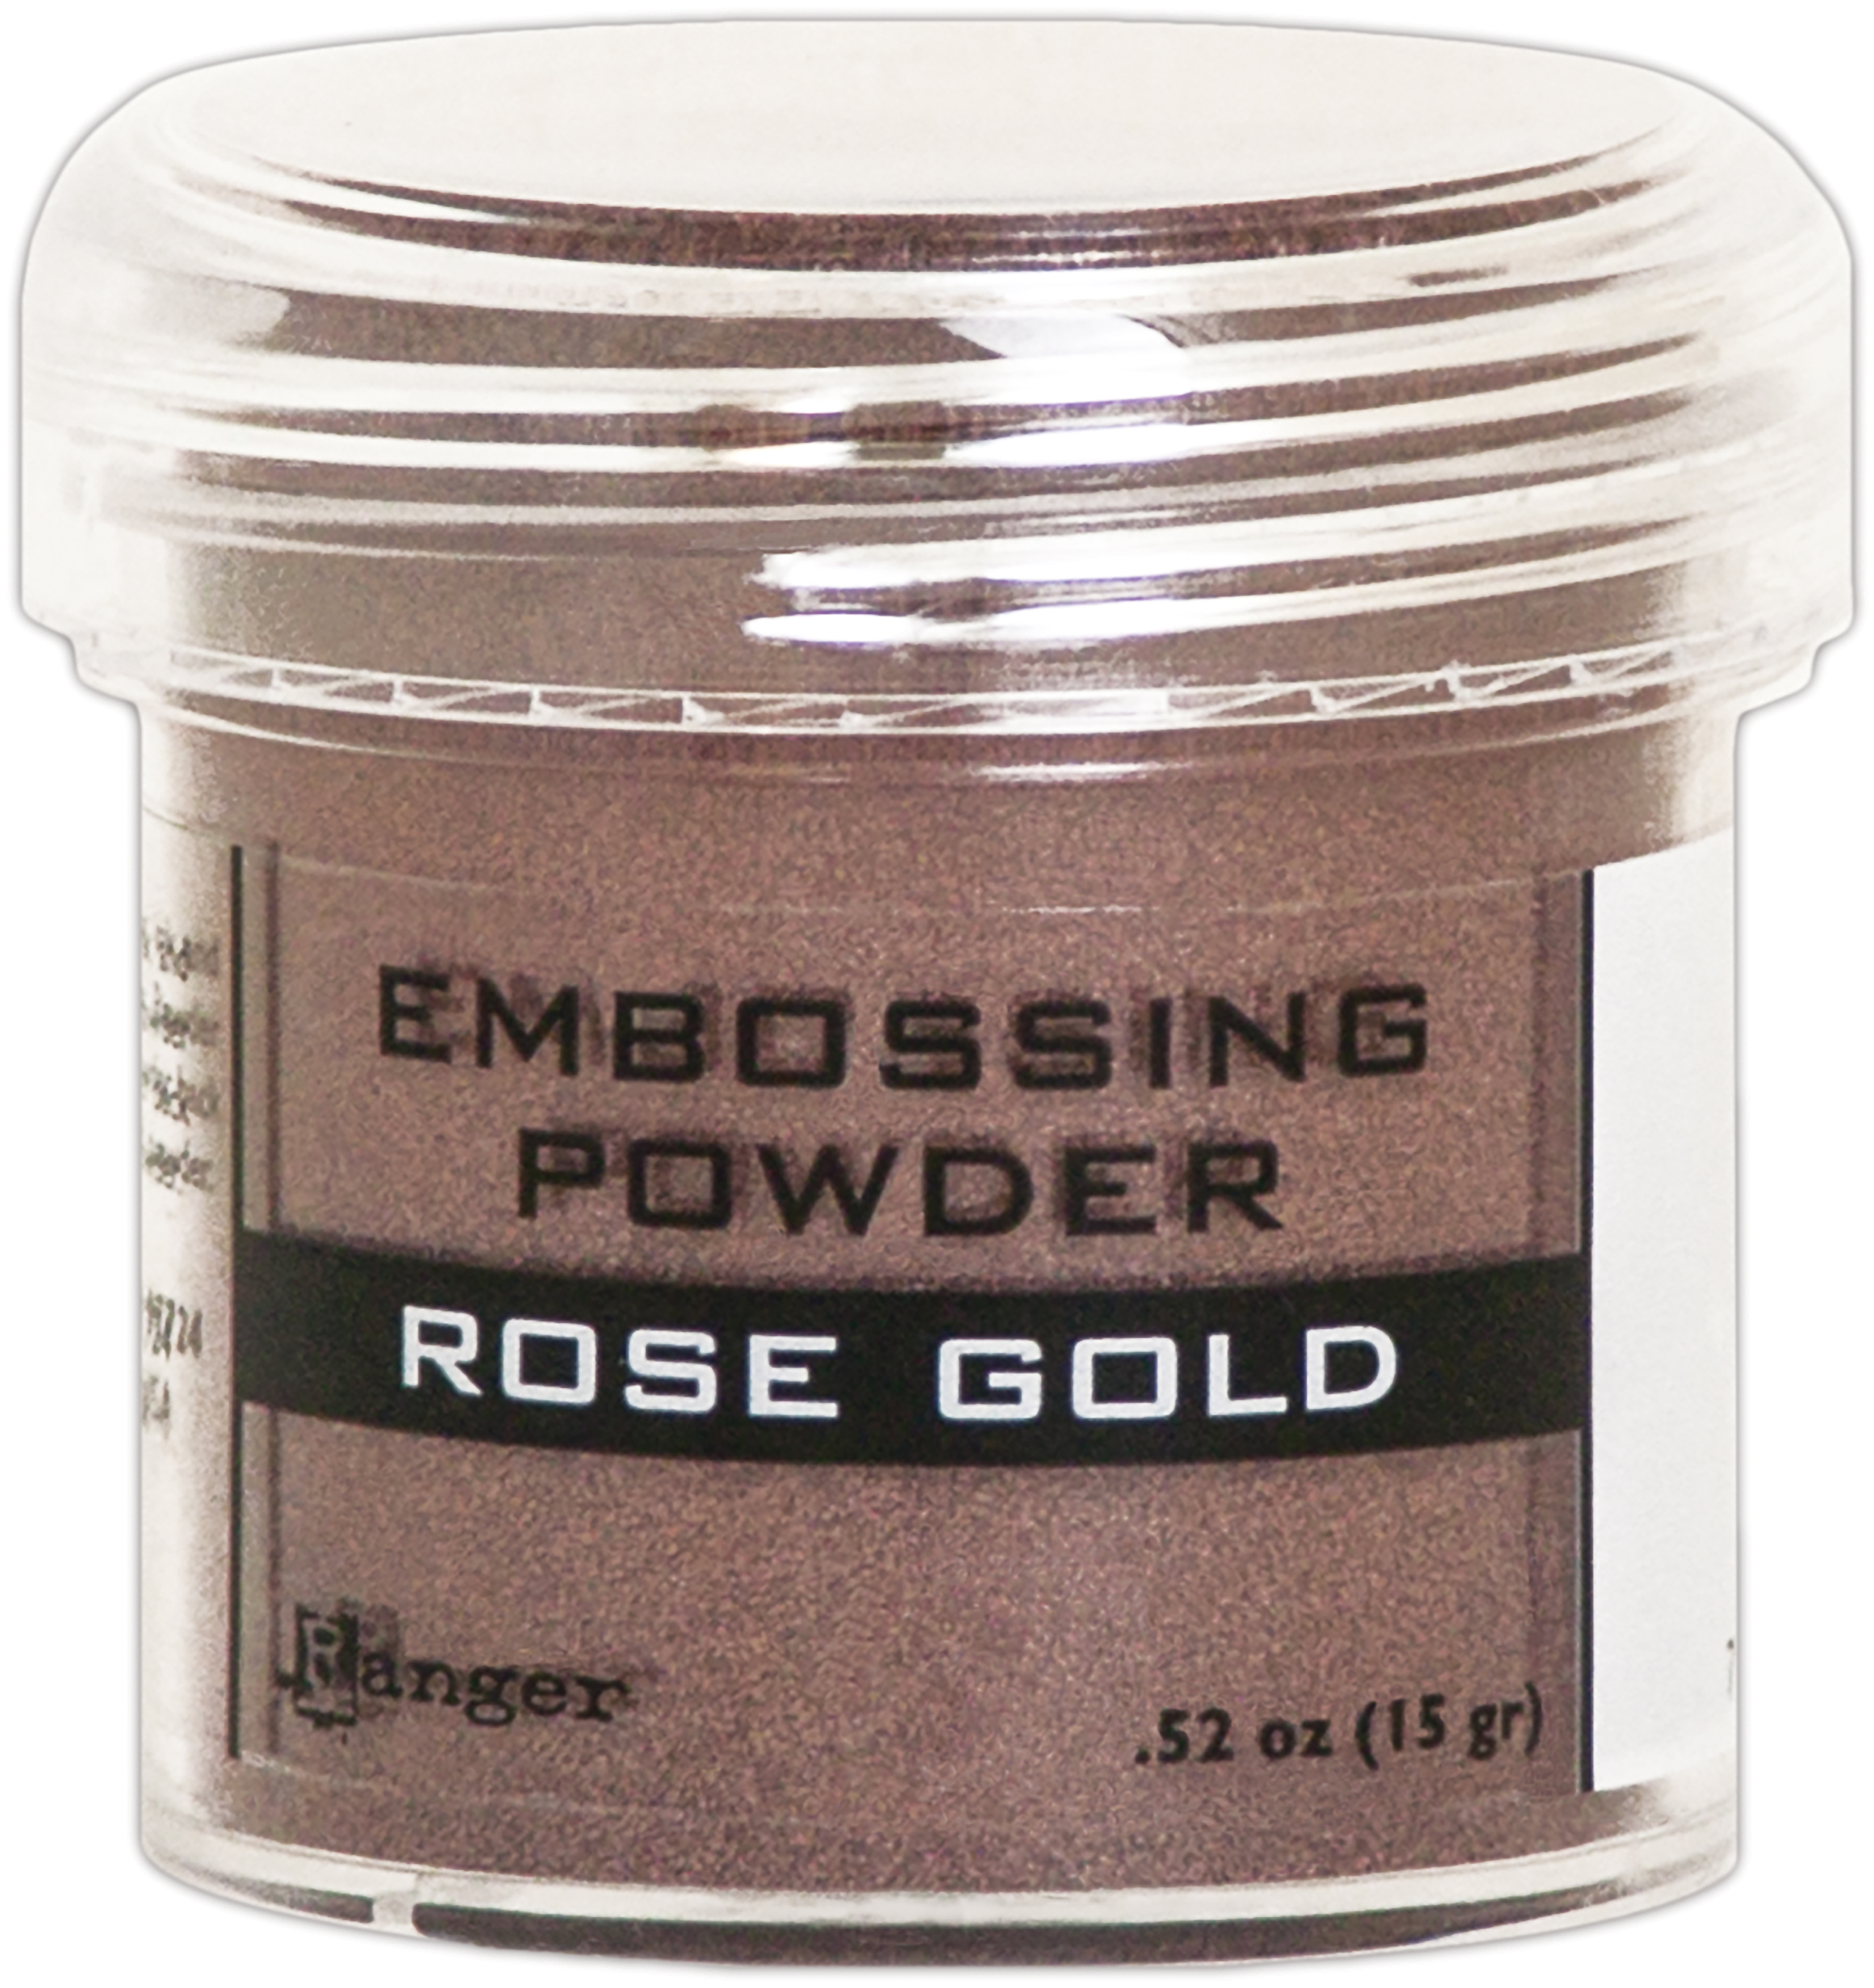 ROSE GOLD -EMBOSSING POWDER